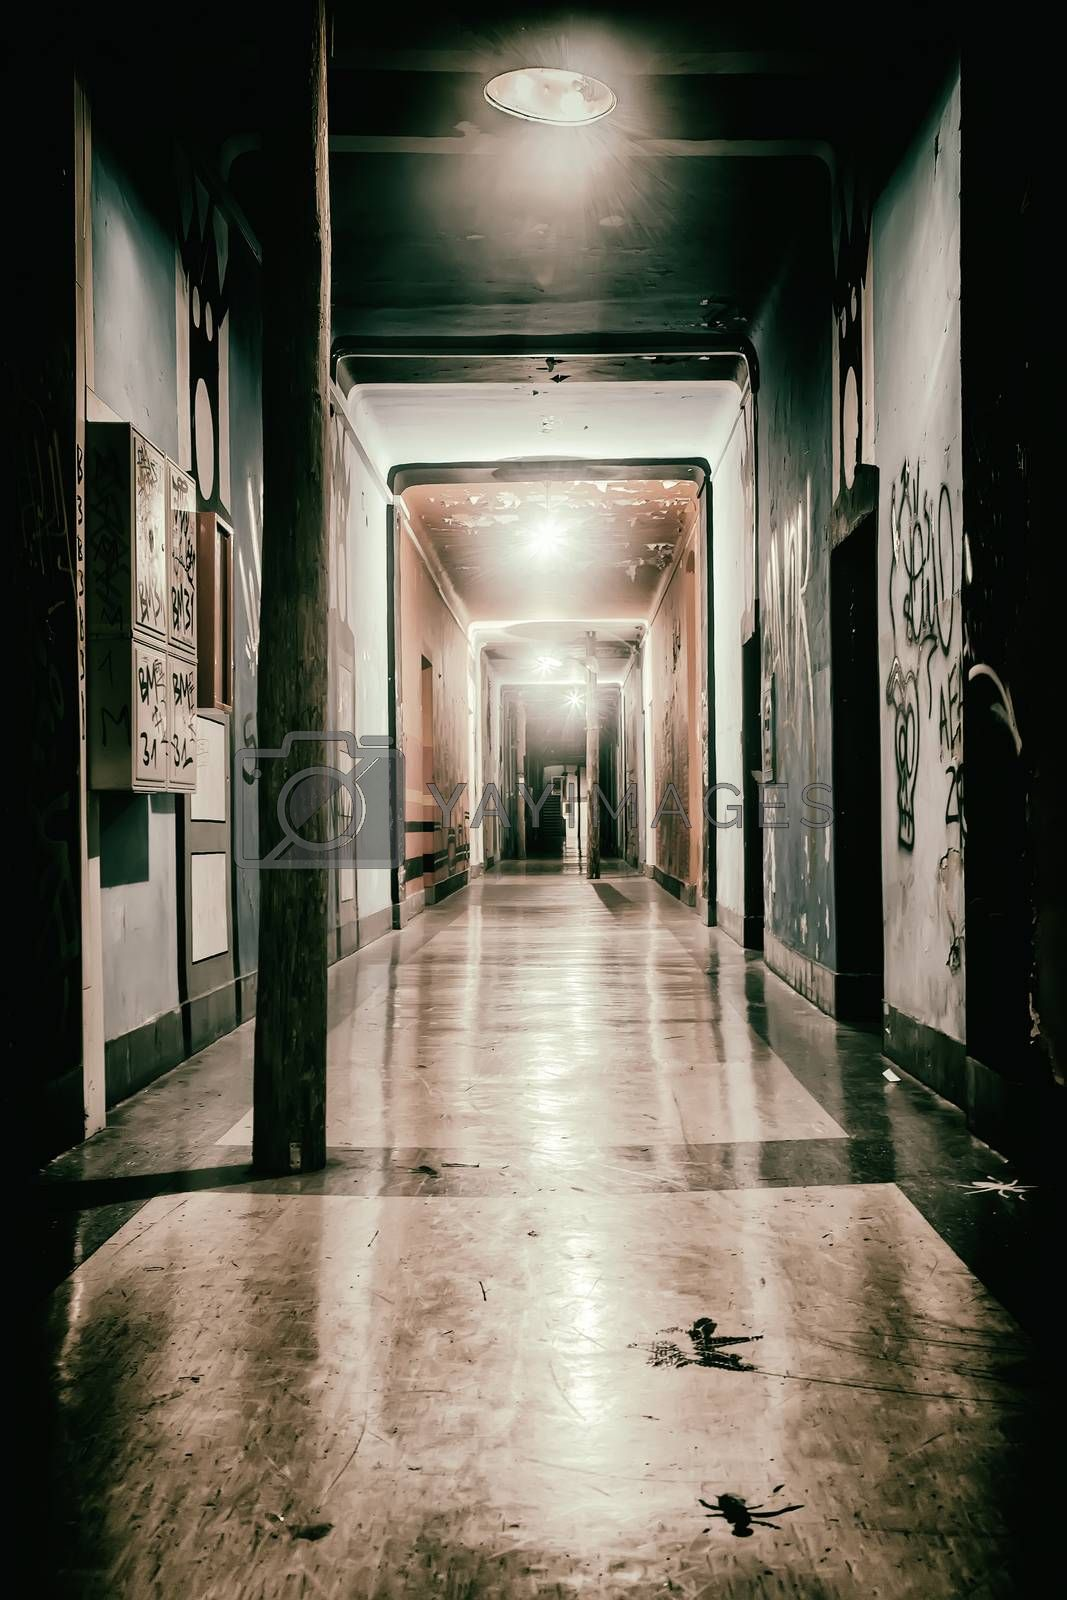 illuminated and empty hallway of the former barracks